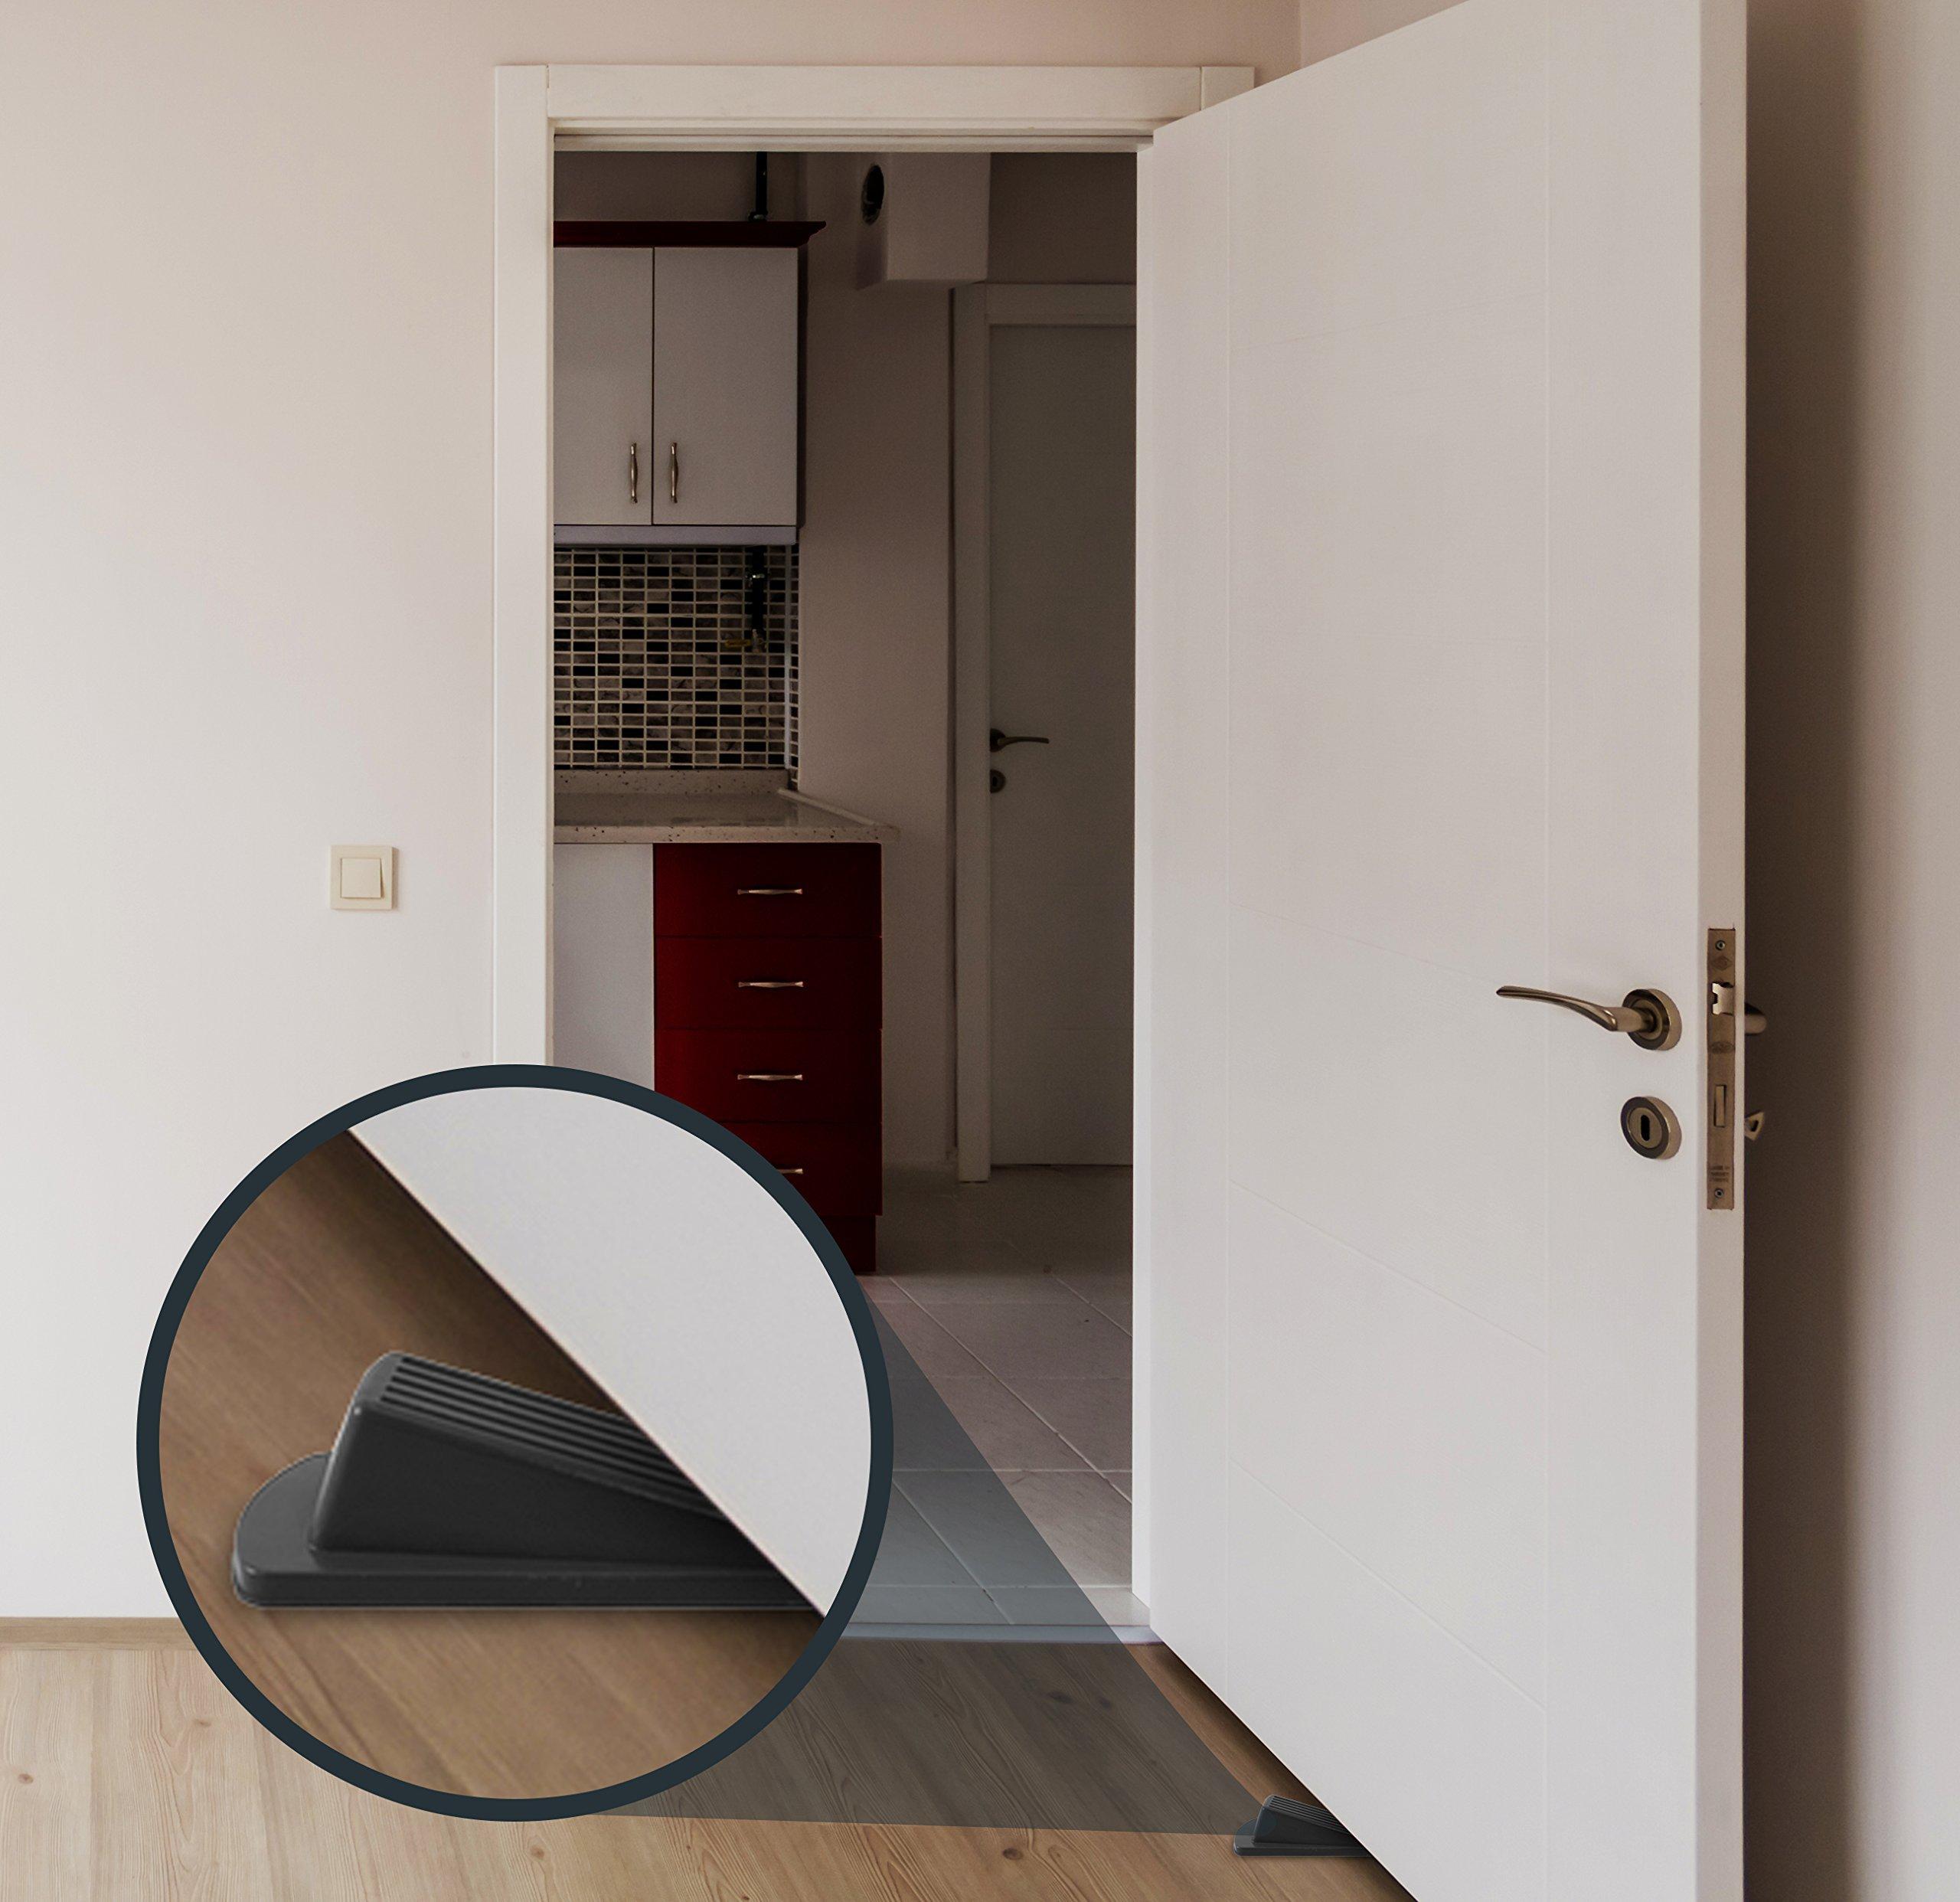 Home Premium Rubber Door Stop - Large Door Stopper Wedge, Multi Surface Design (4 Pack, Black) by HOME PREMIUM (Image #6)